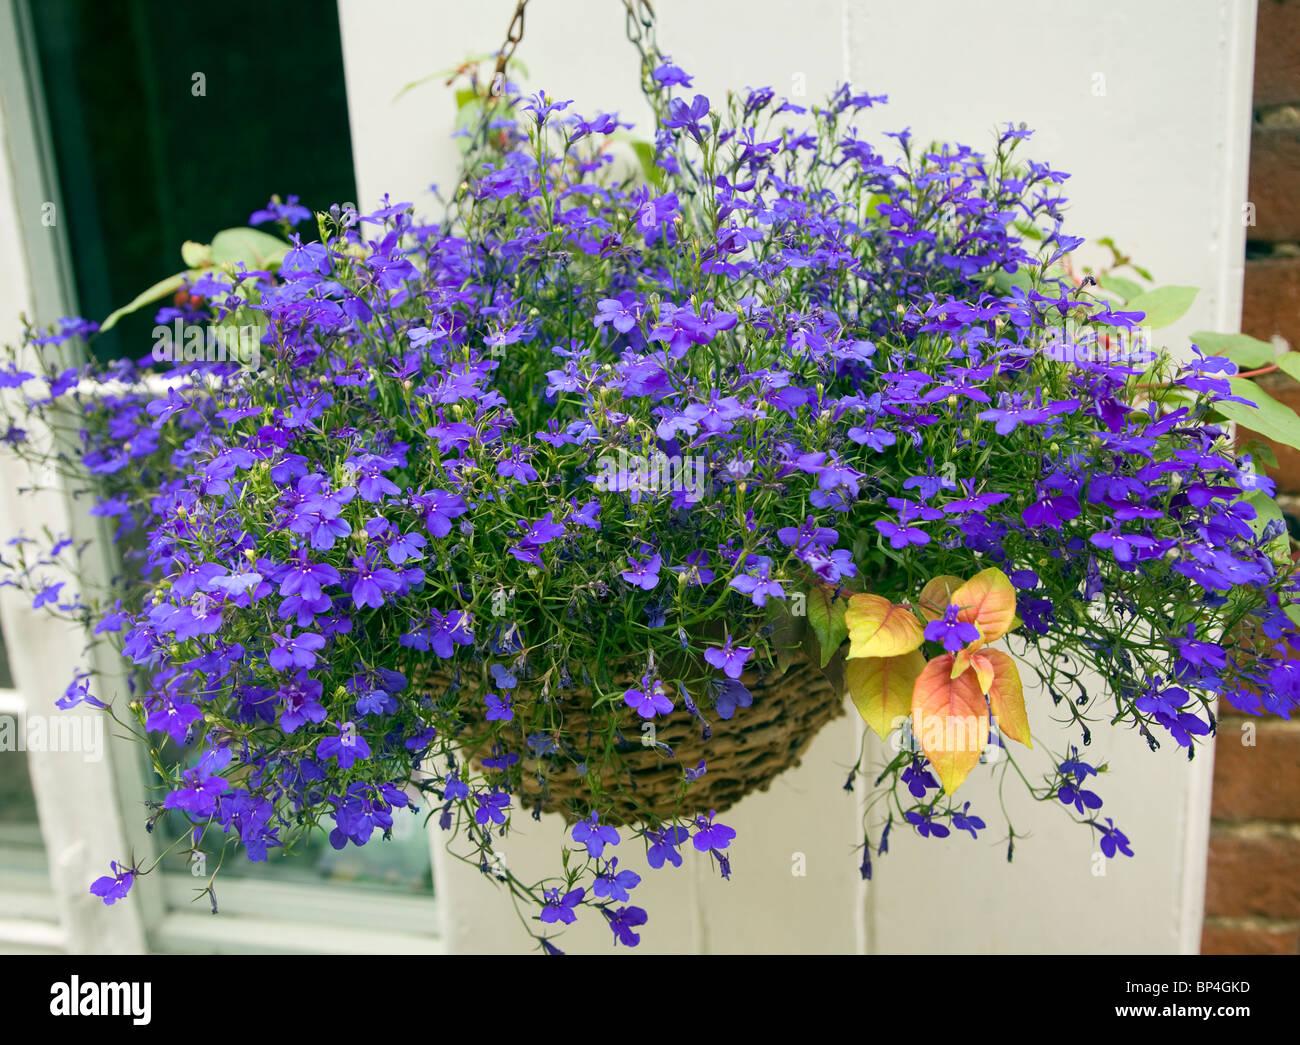 Hanging basket blue lobelia flowering plant stock photo 30833697 hanging basket blue lobelia flowering plant izmirmasajfo